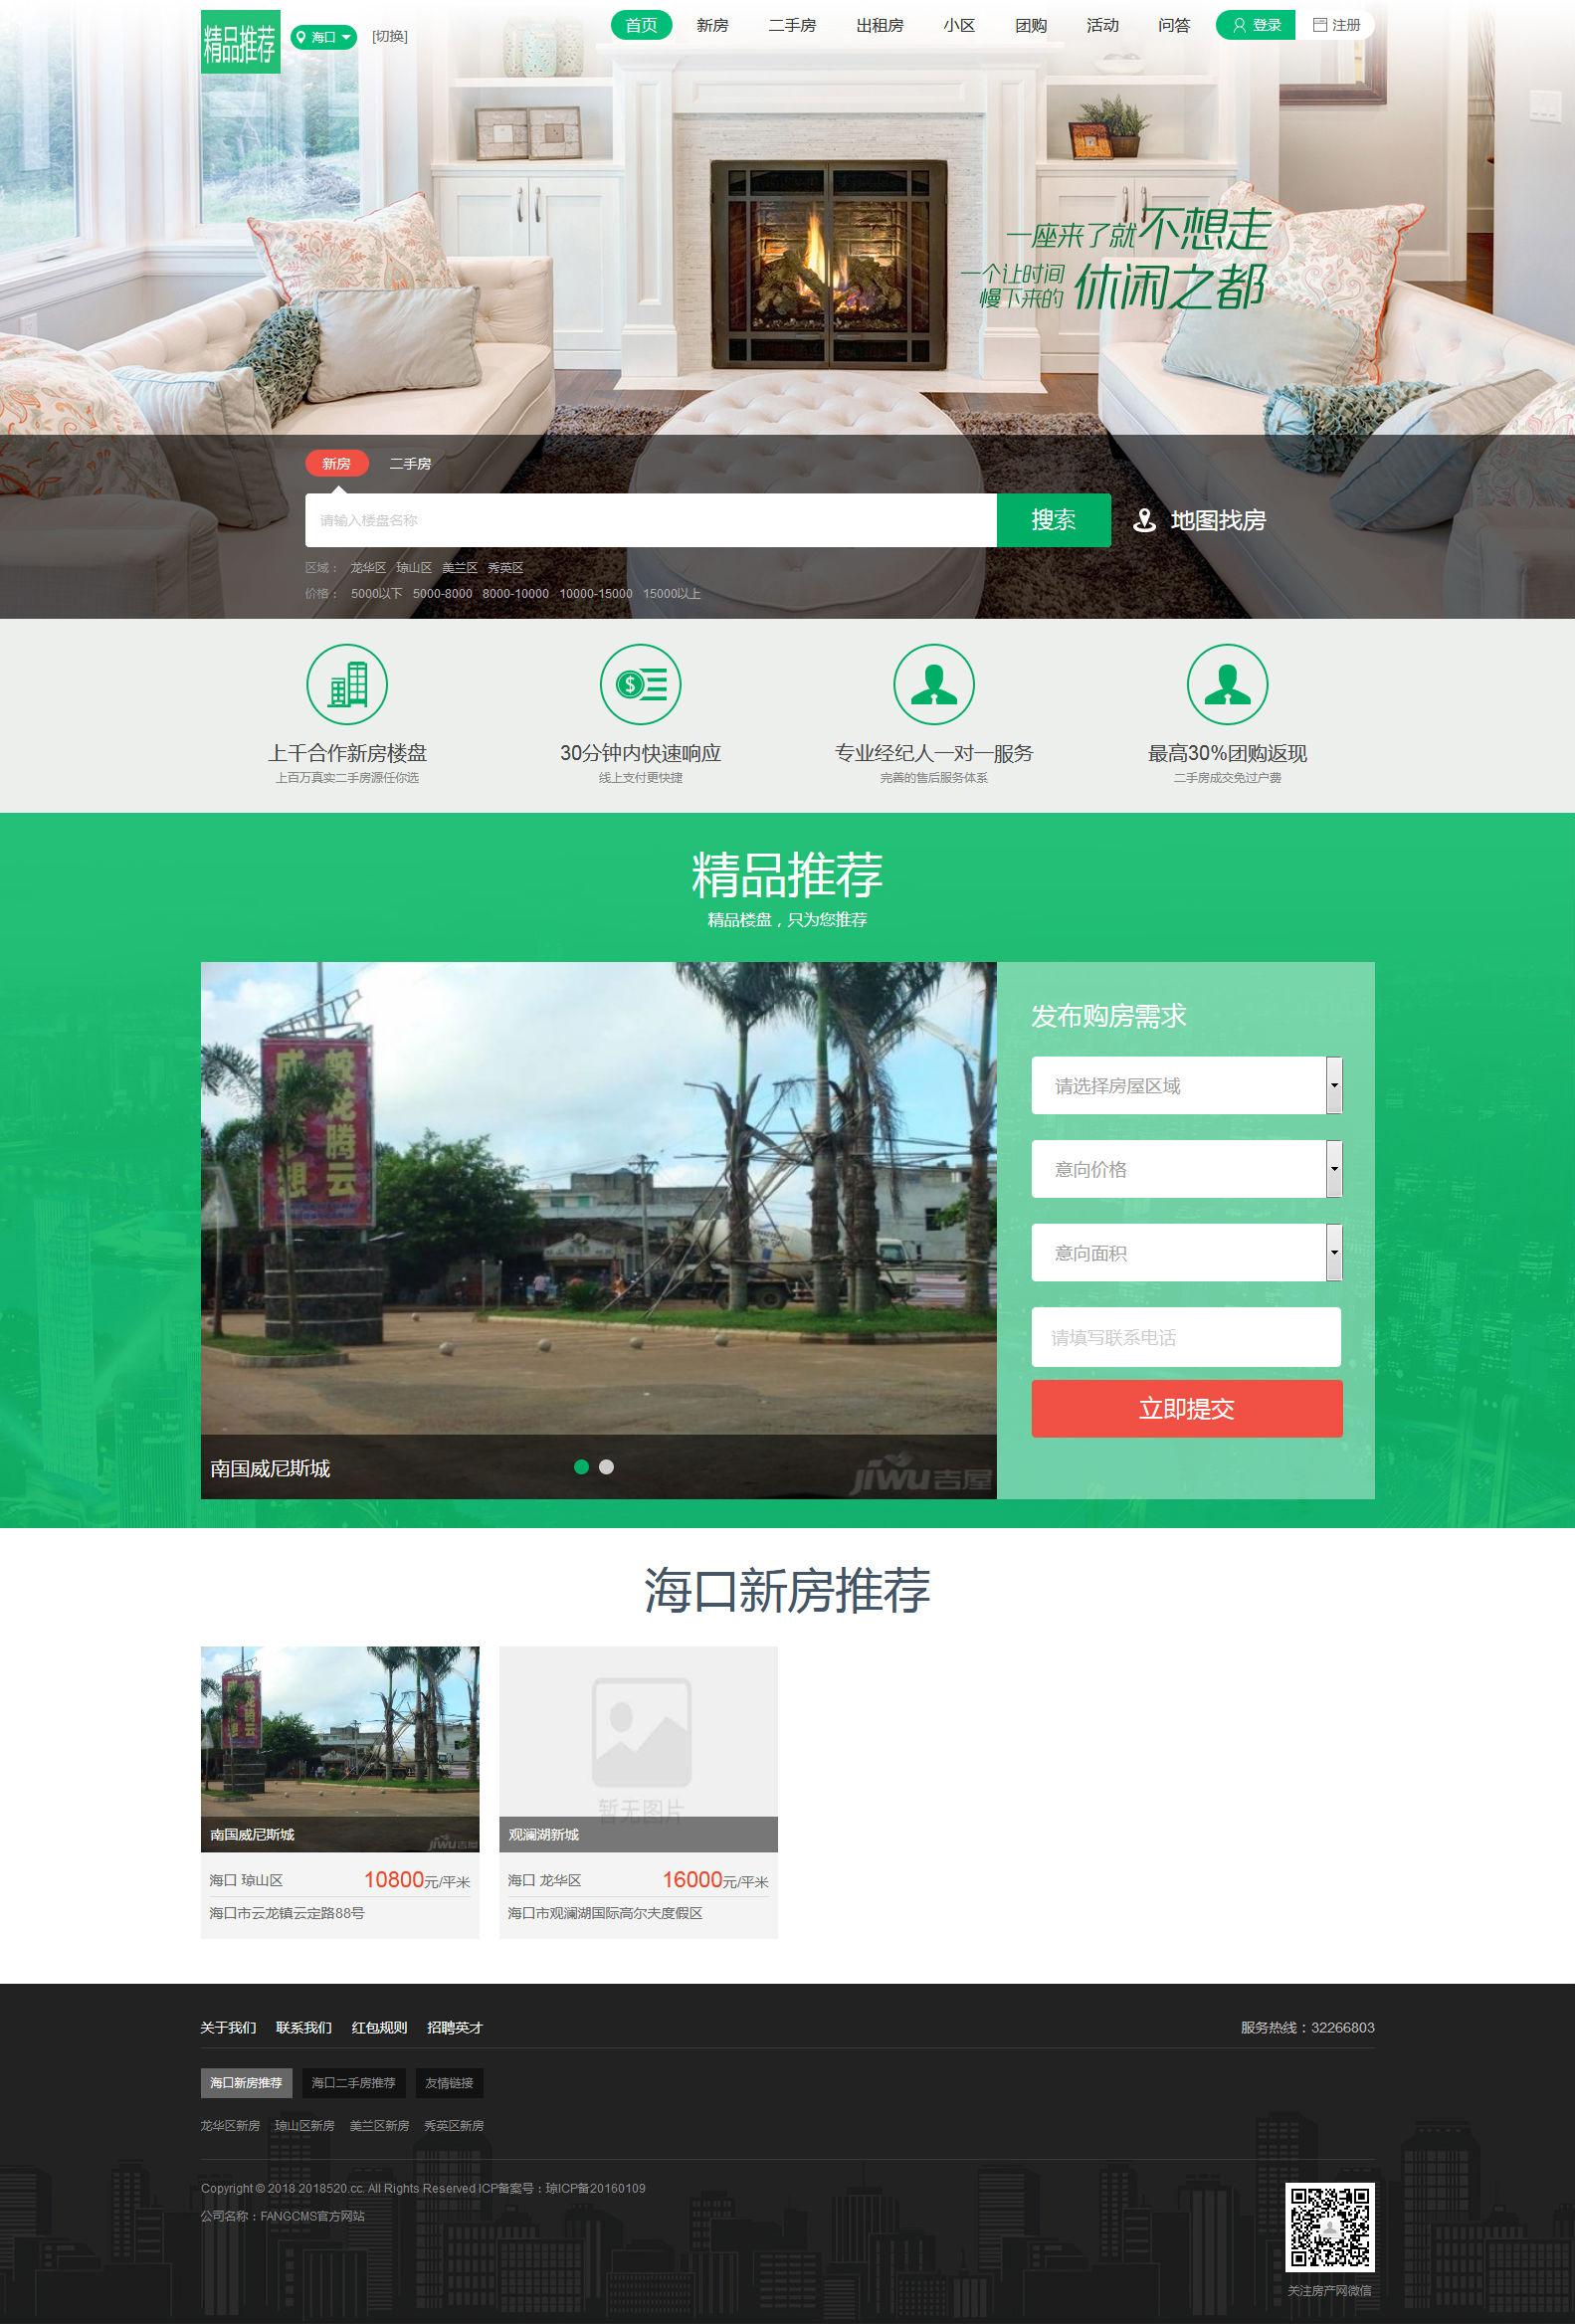 Thinkphp开发的开源版本多城市房产网站源码,多城市版站群版房产源码